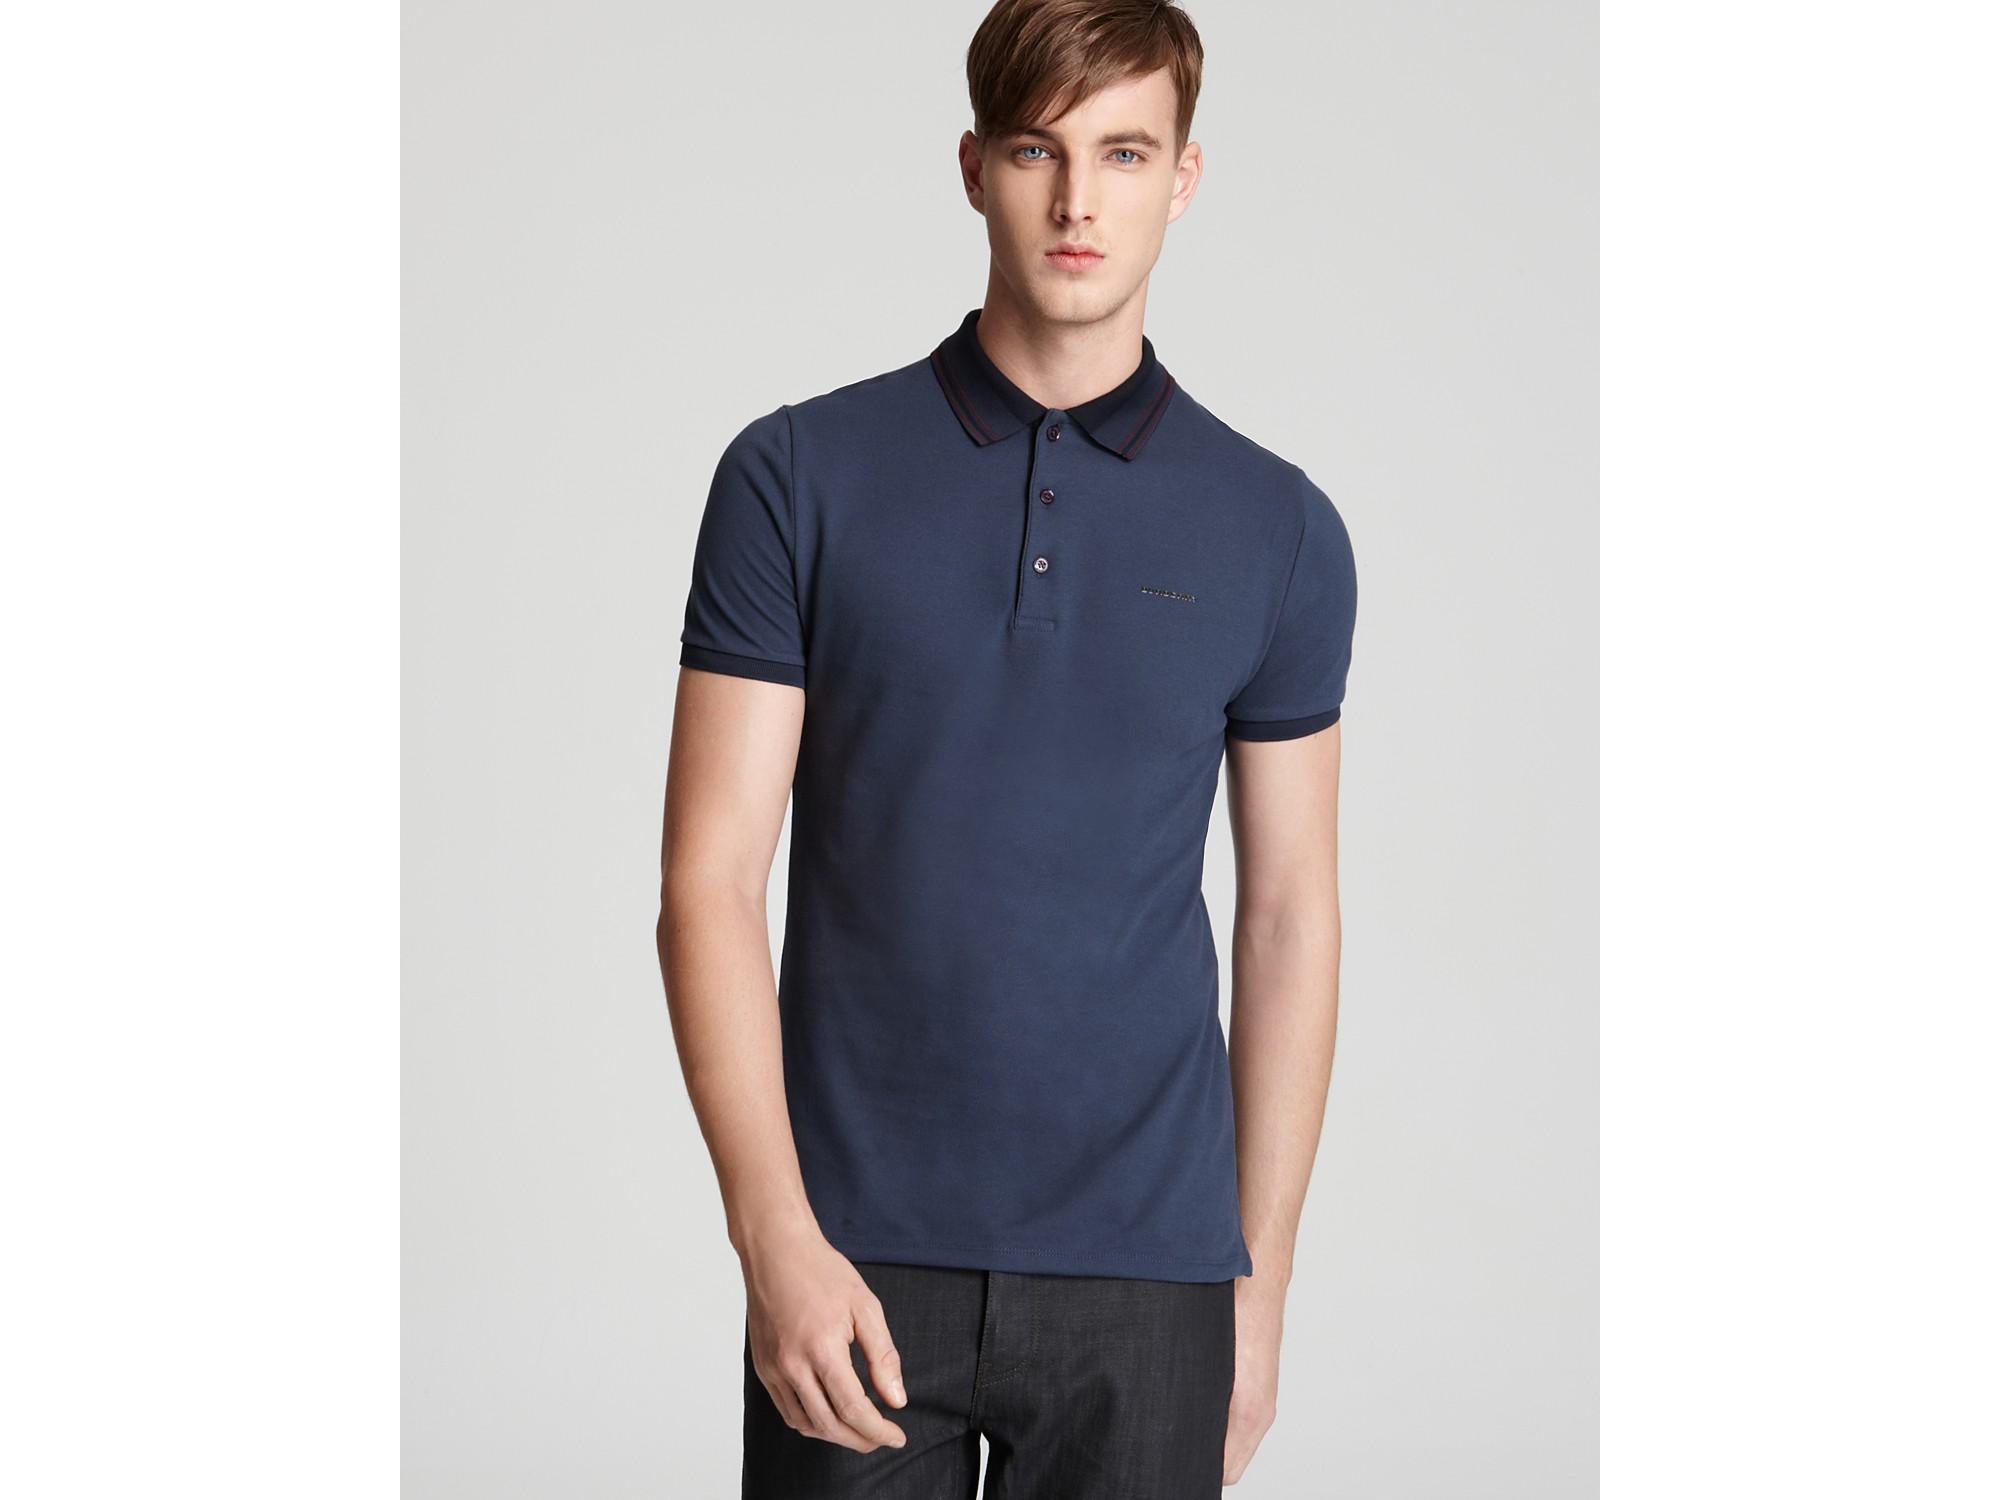 866638ea Burberry London Adler Slim Fit Polo in Blue for Men - Lyst